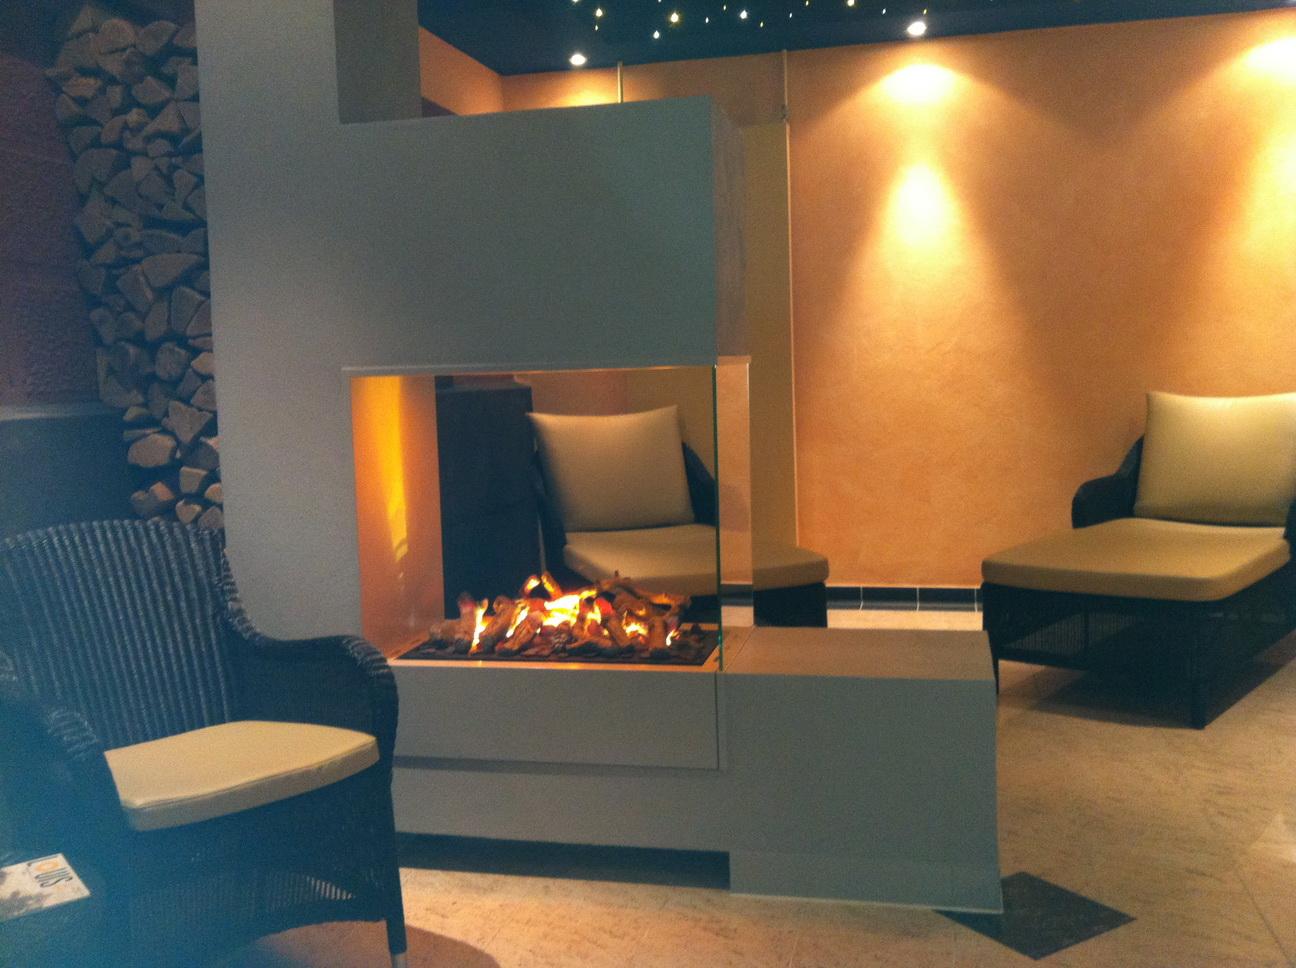 kur royal weise partner gestaltung f r spa und wellness. Black Bedroom Furniture Sets. Home Design Ideas